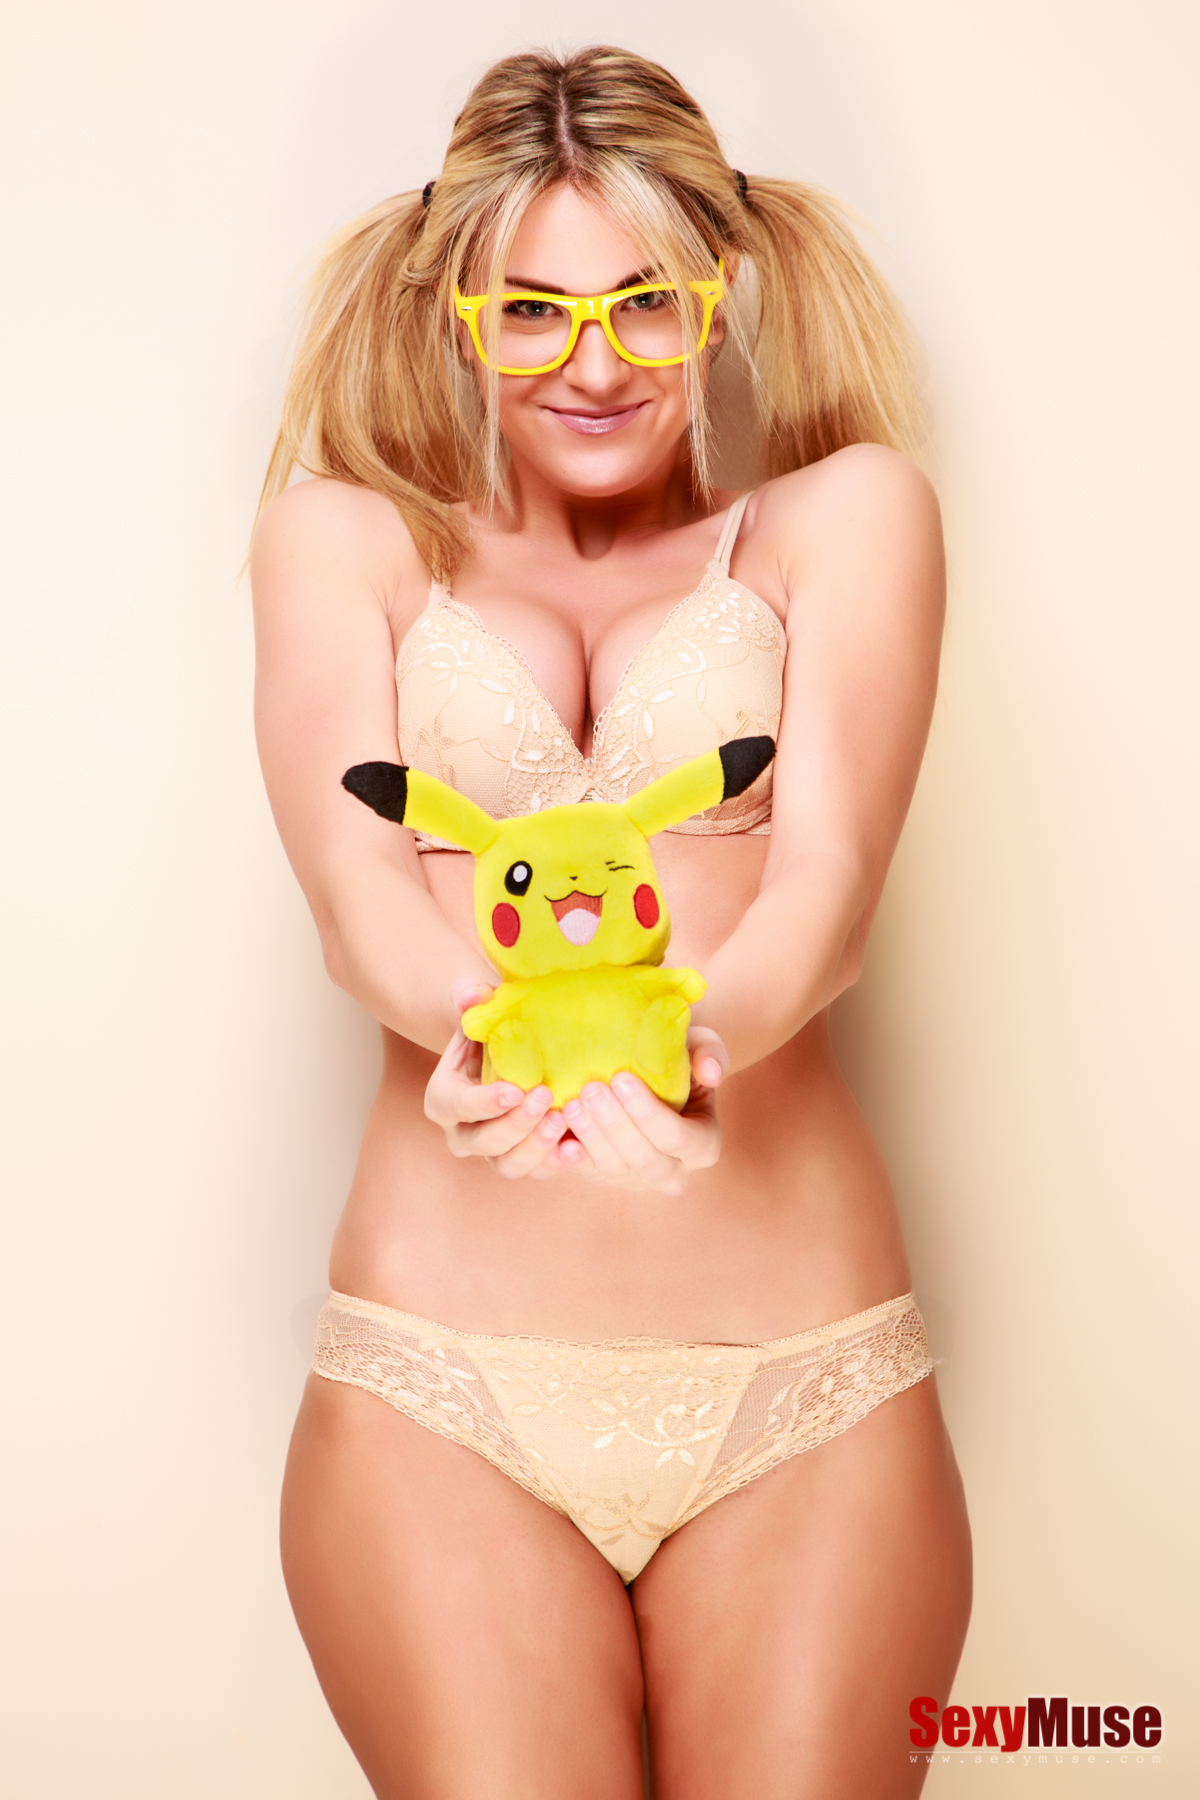 SexyMuse by Rocke pokemongo 04042016 2